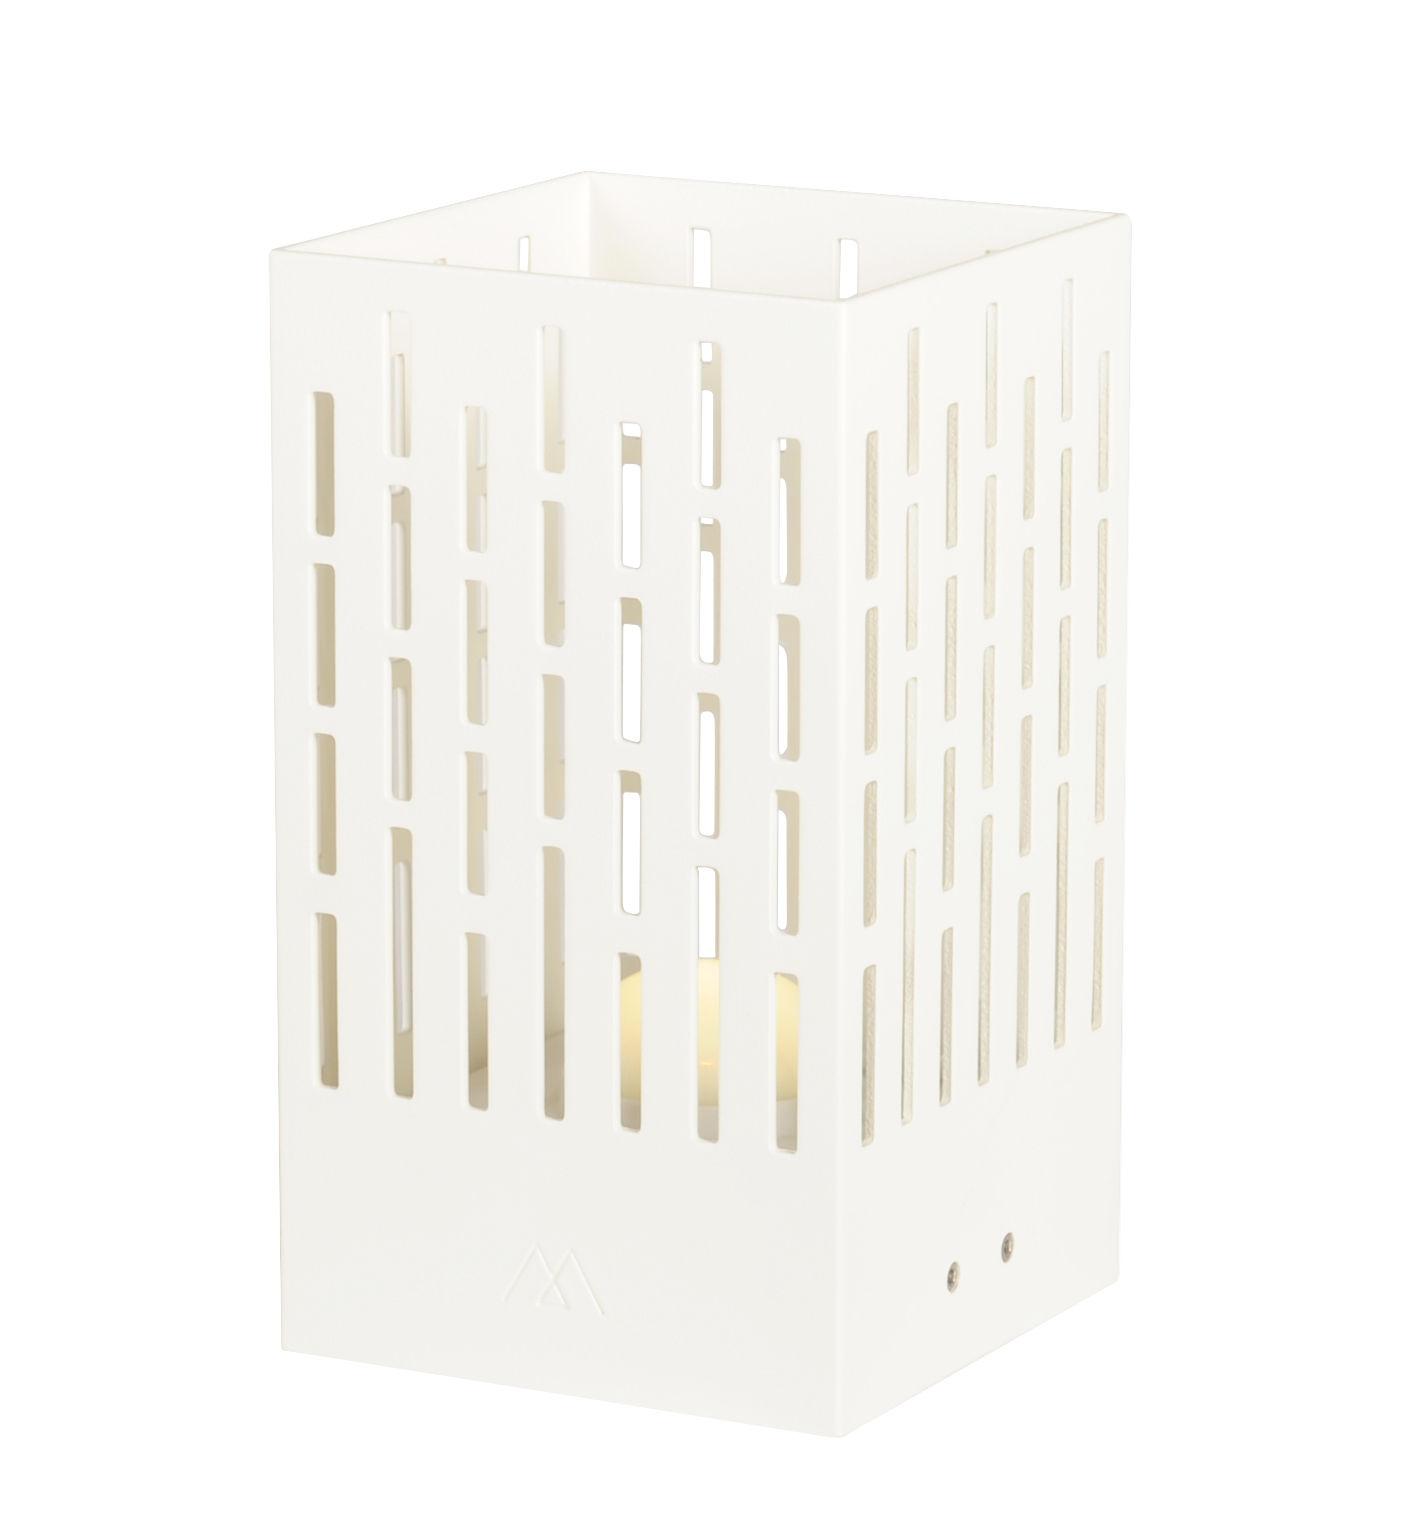 la lampe pose 04 led kabellos maiori solarlampe. Black Bedroom Furniture Sets. Home Design Ideas